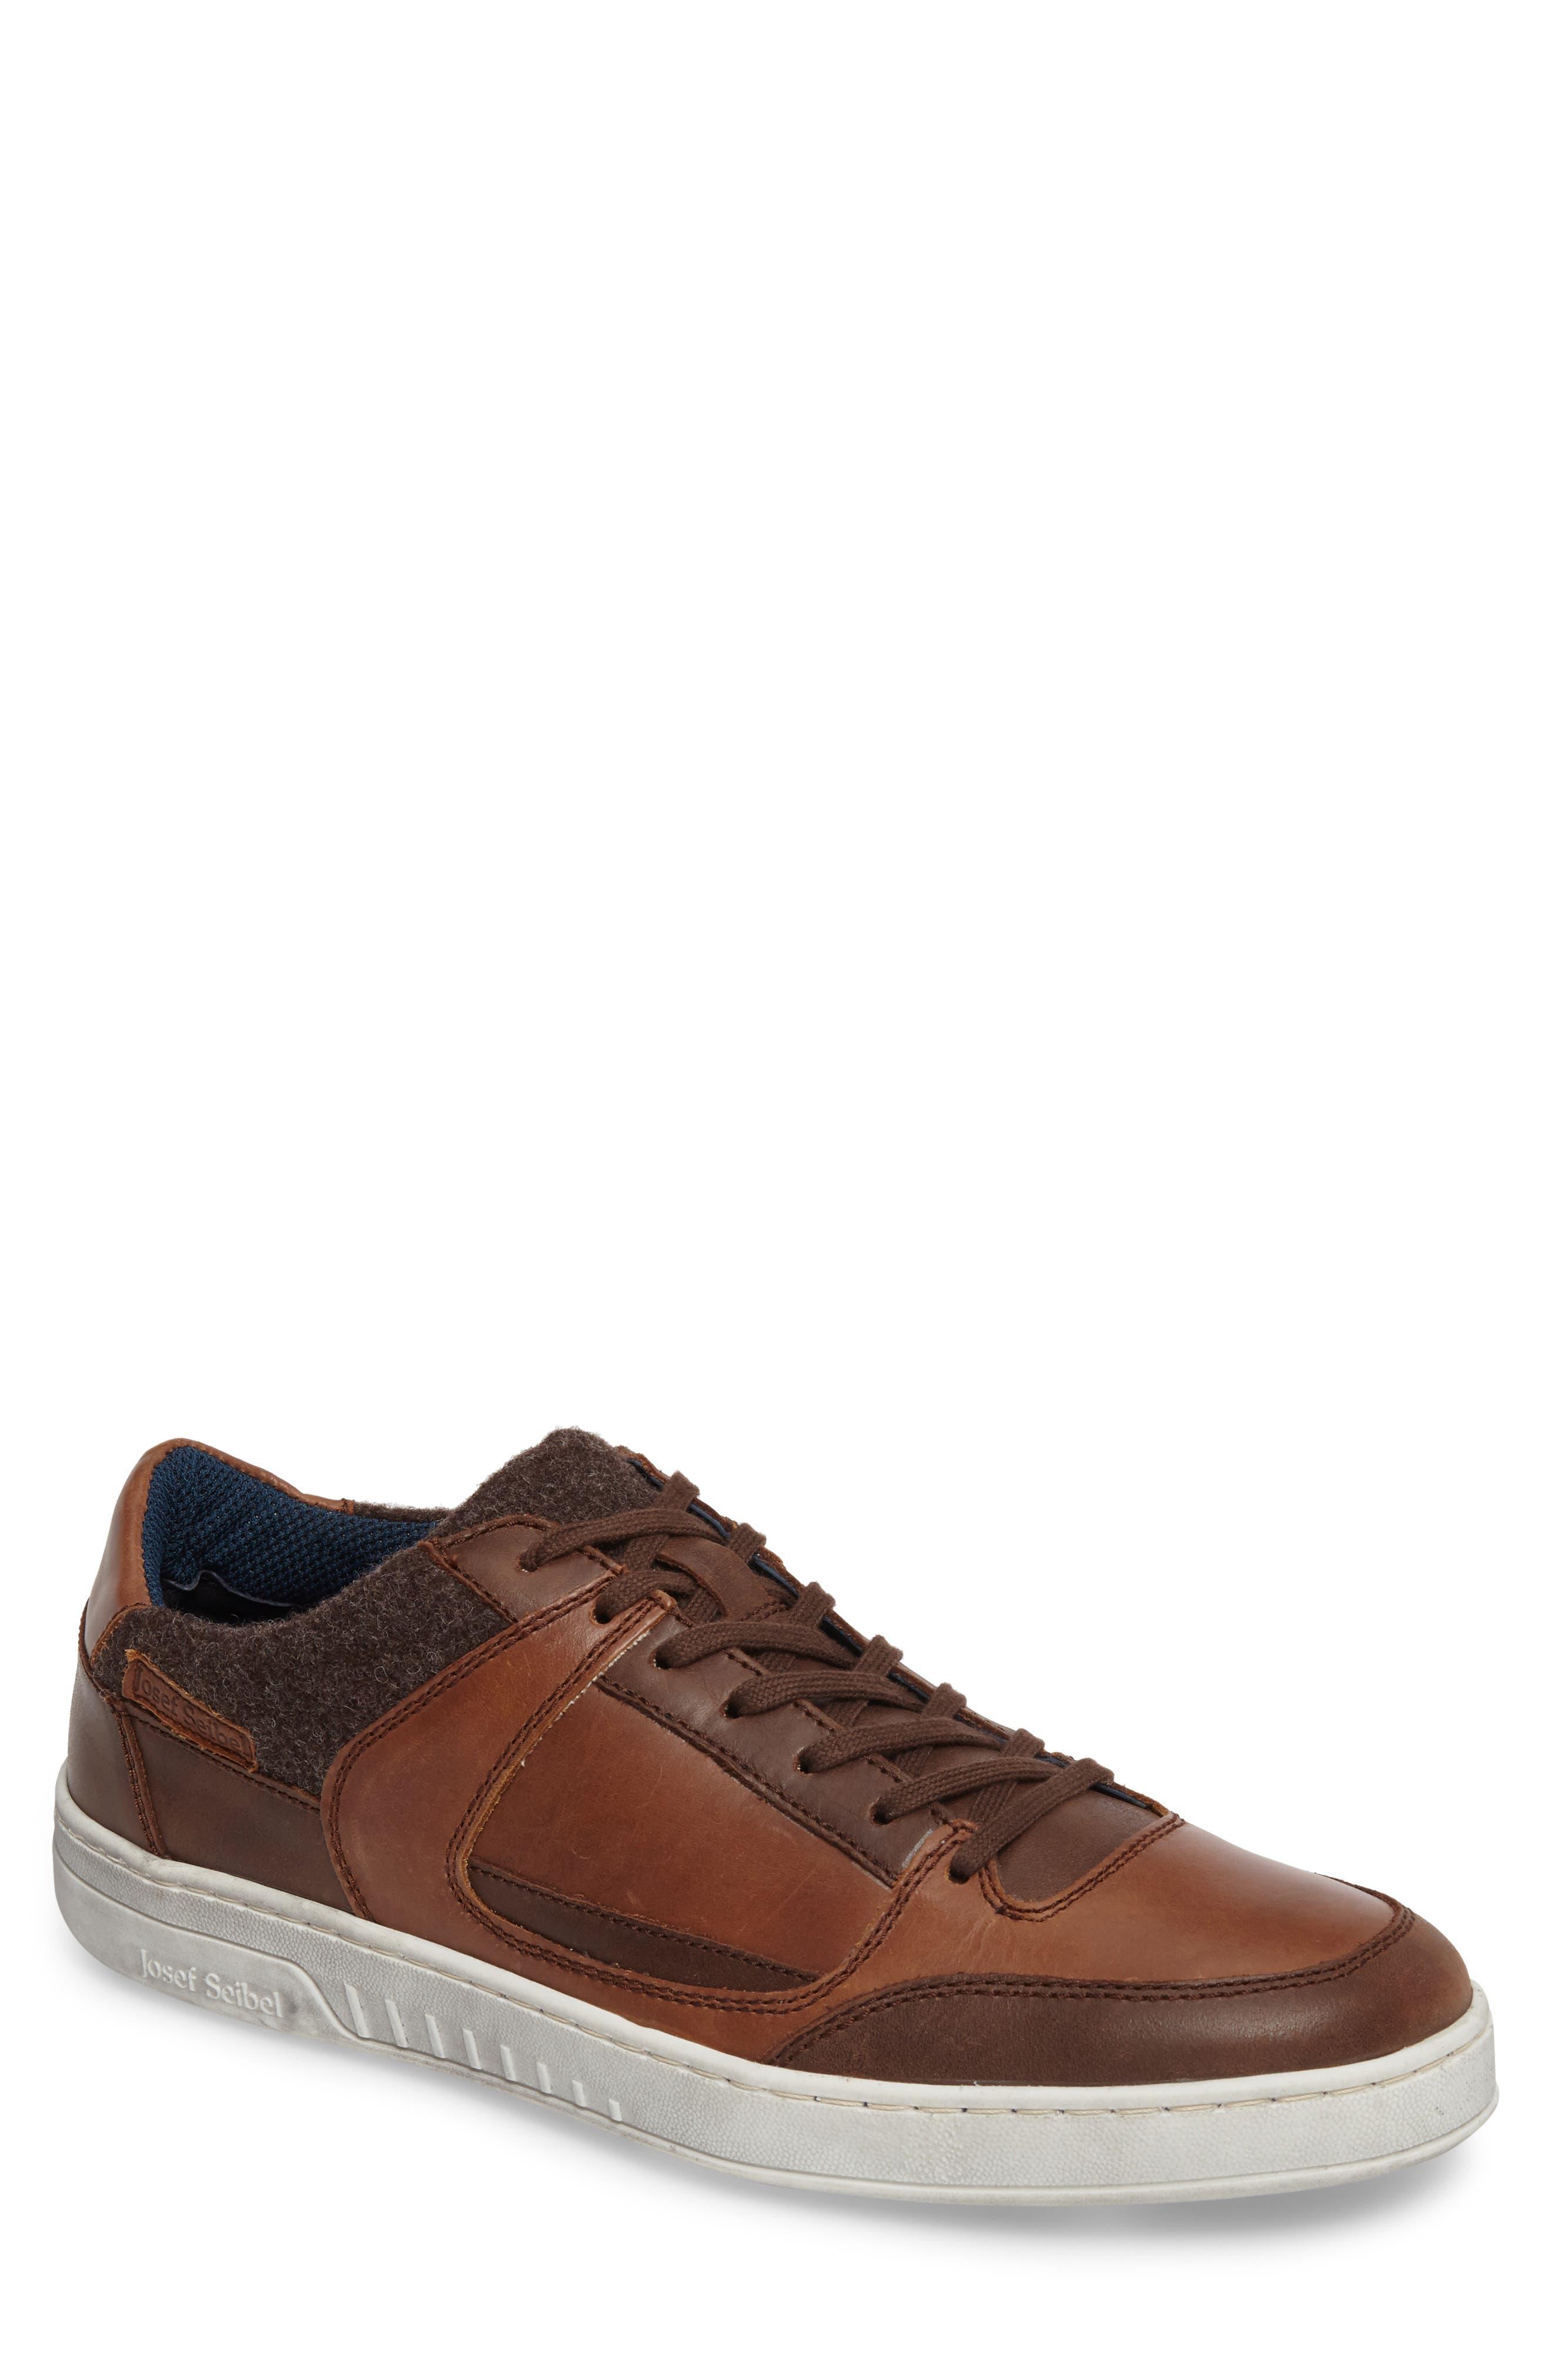 Josef Seibel Dresda 19 Sneaker (Men)